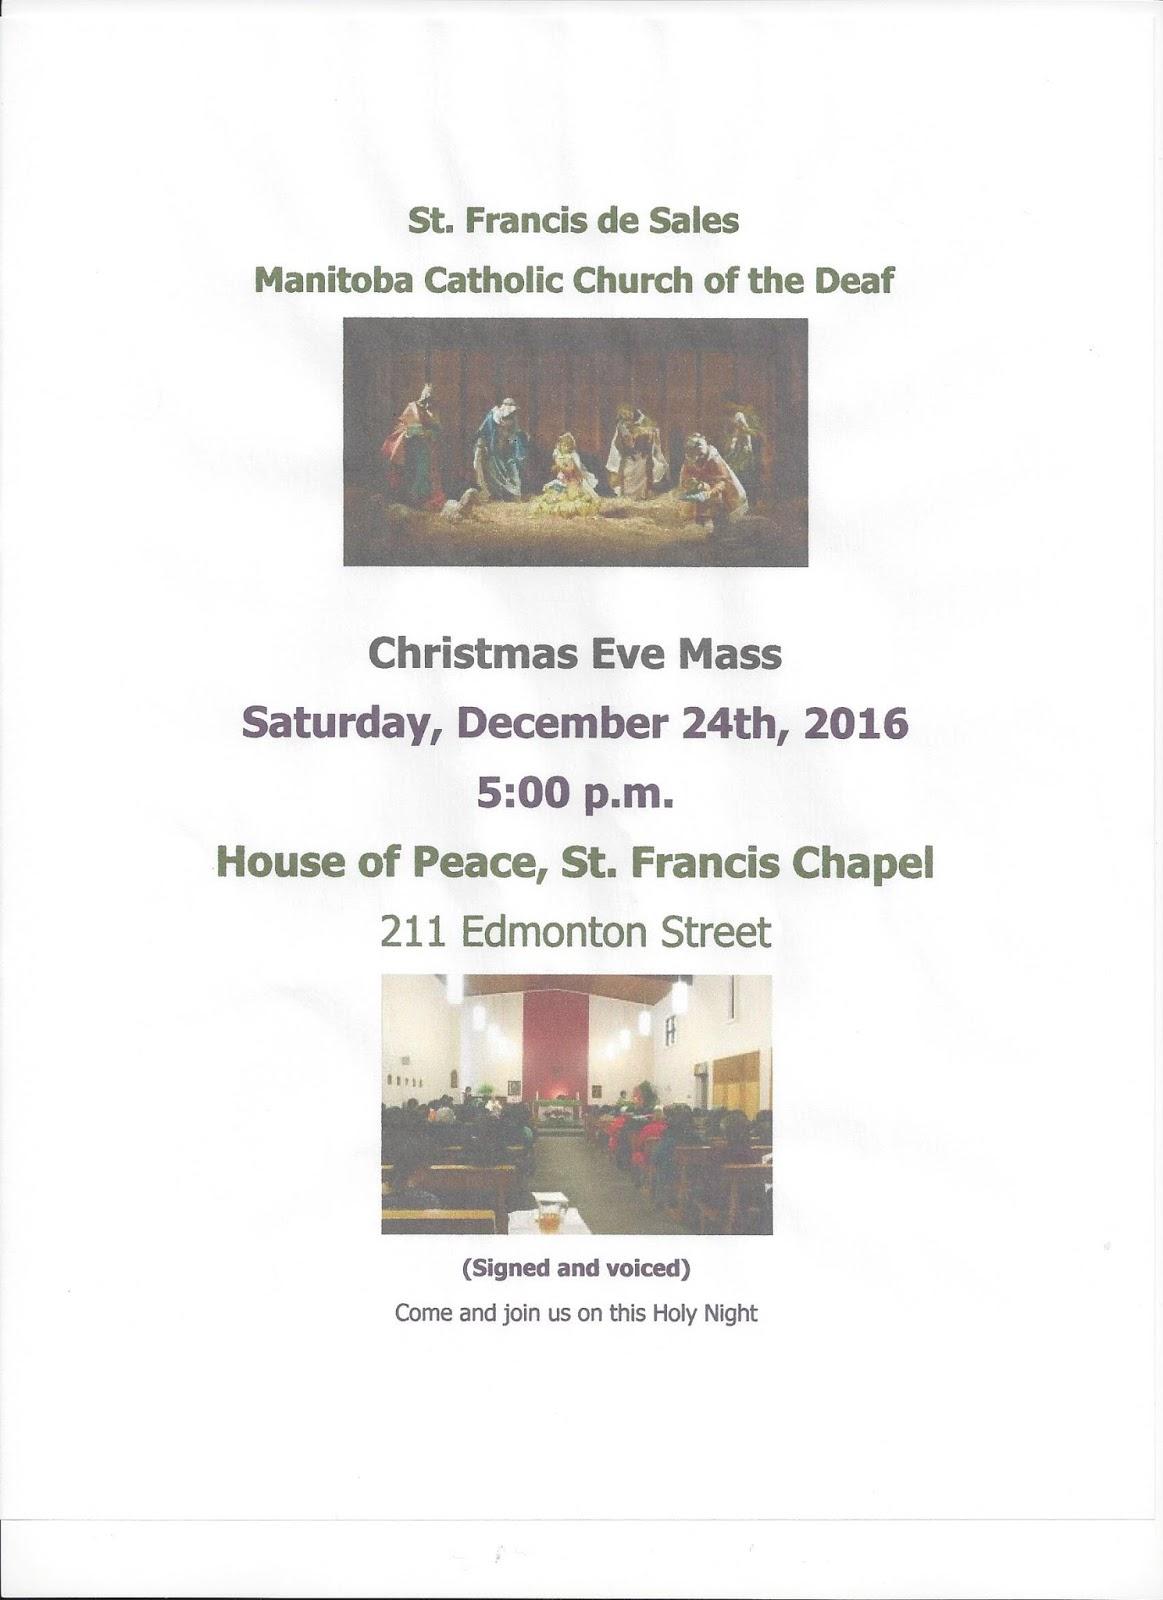 st francis de sales manitoba catholic church of the deaf mccd christmas eve mass house of peace dec 24th - Christmas Eve Sales